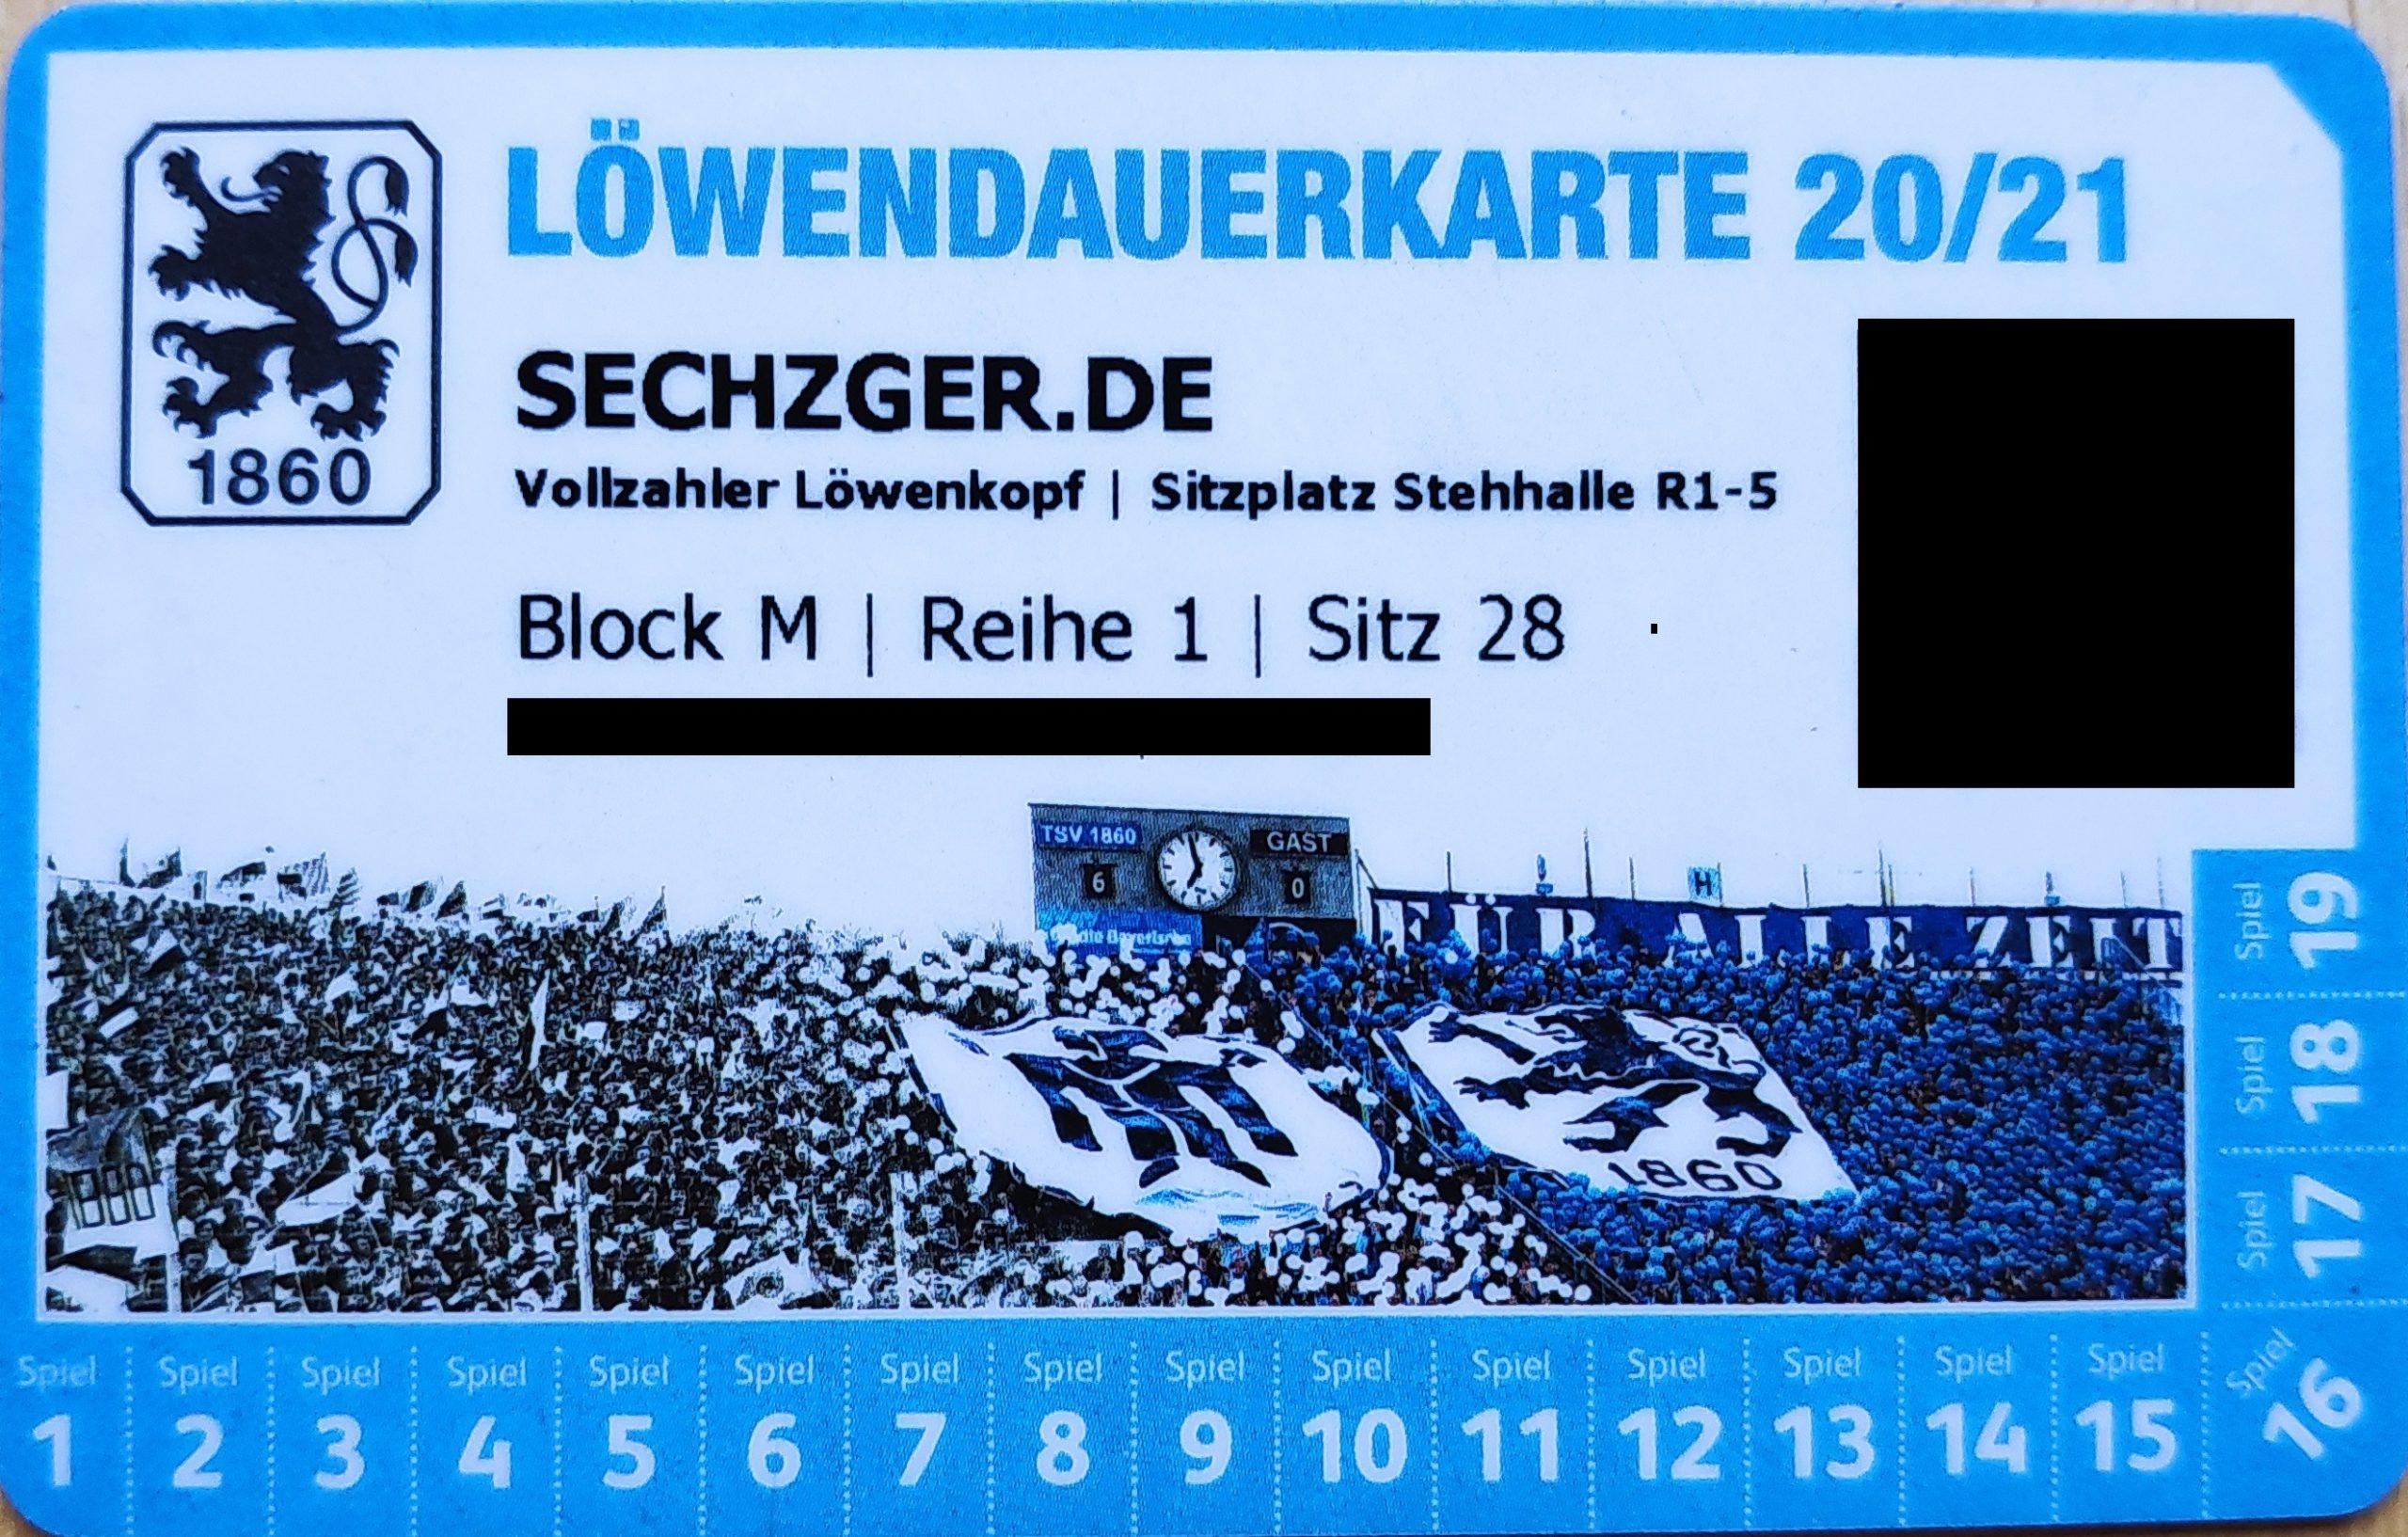 TSV 1860 Dauerkarte